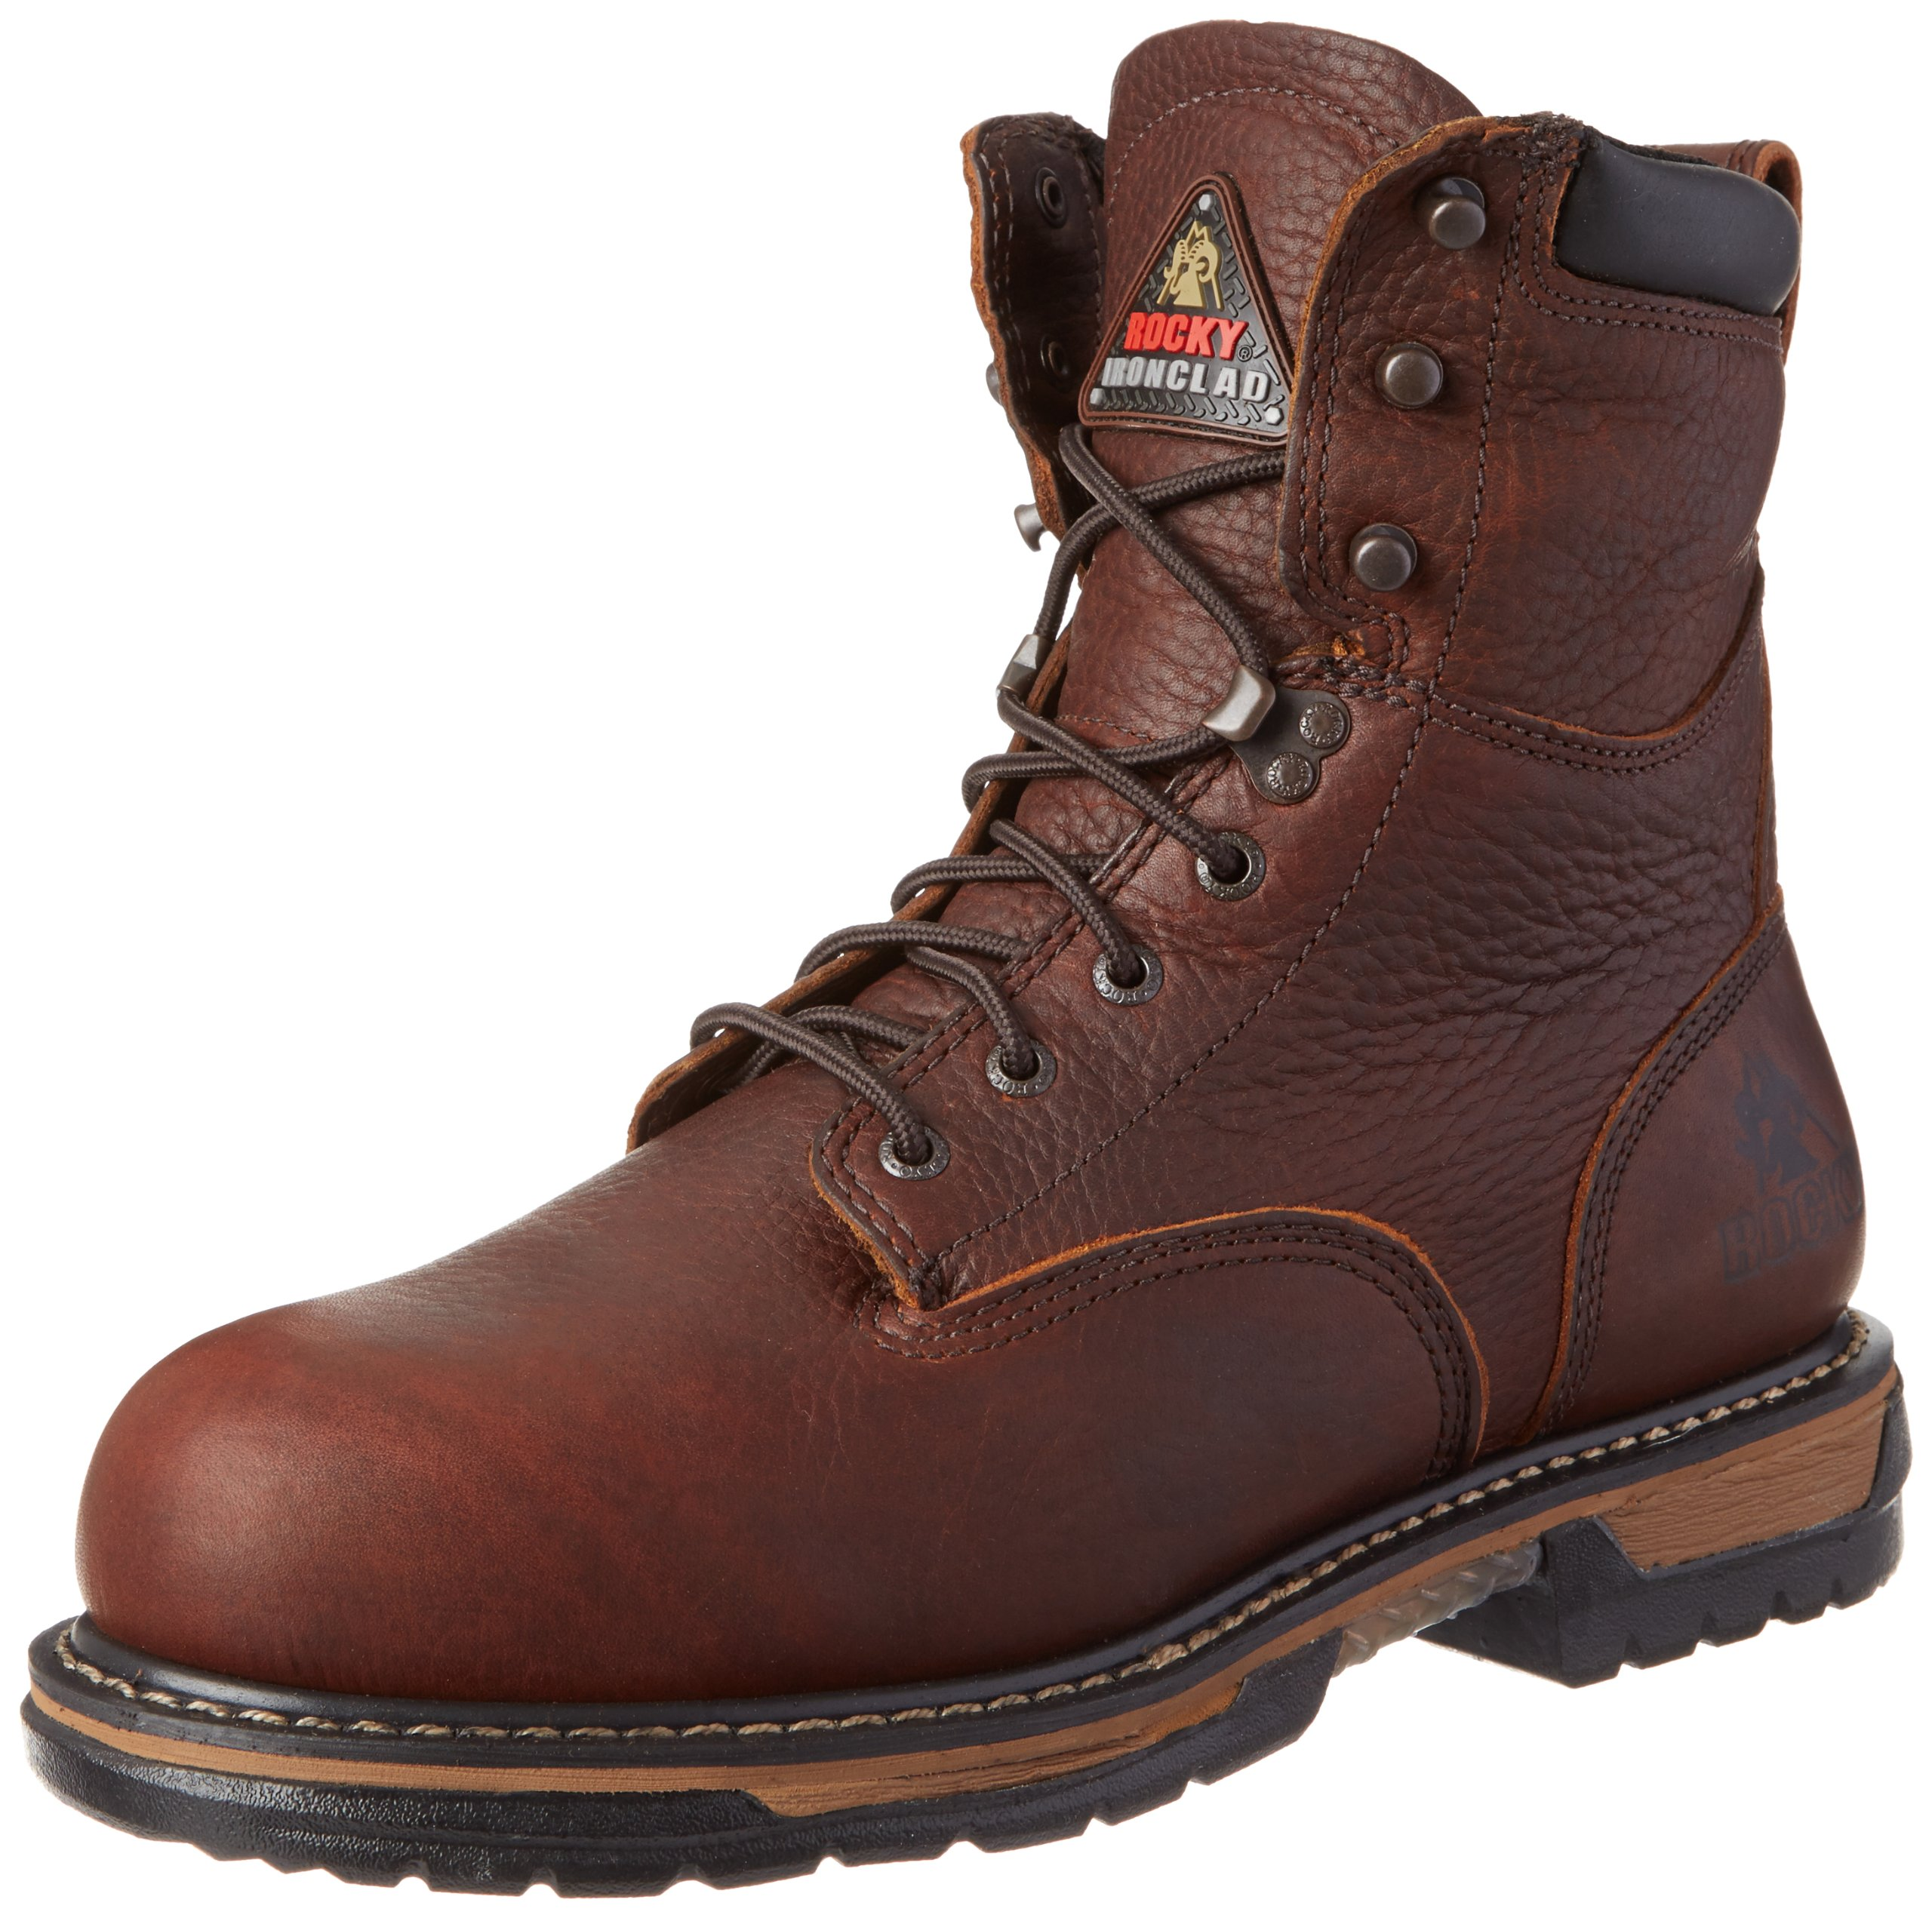 Rocky Men's Iron Clad Eight Inch Steel Toe Work Boot,Brown,10 M US